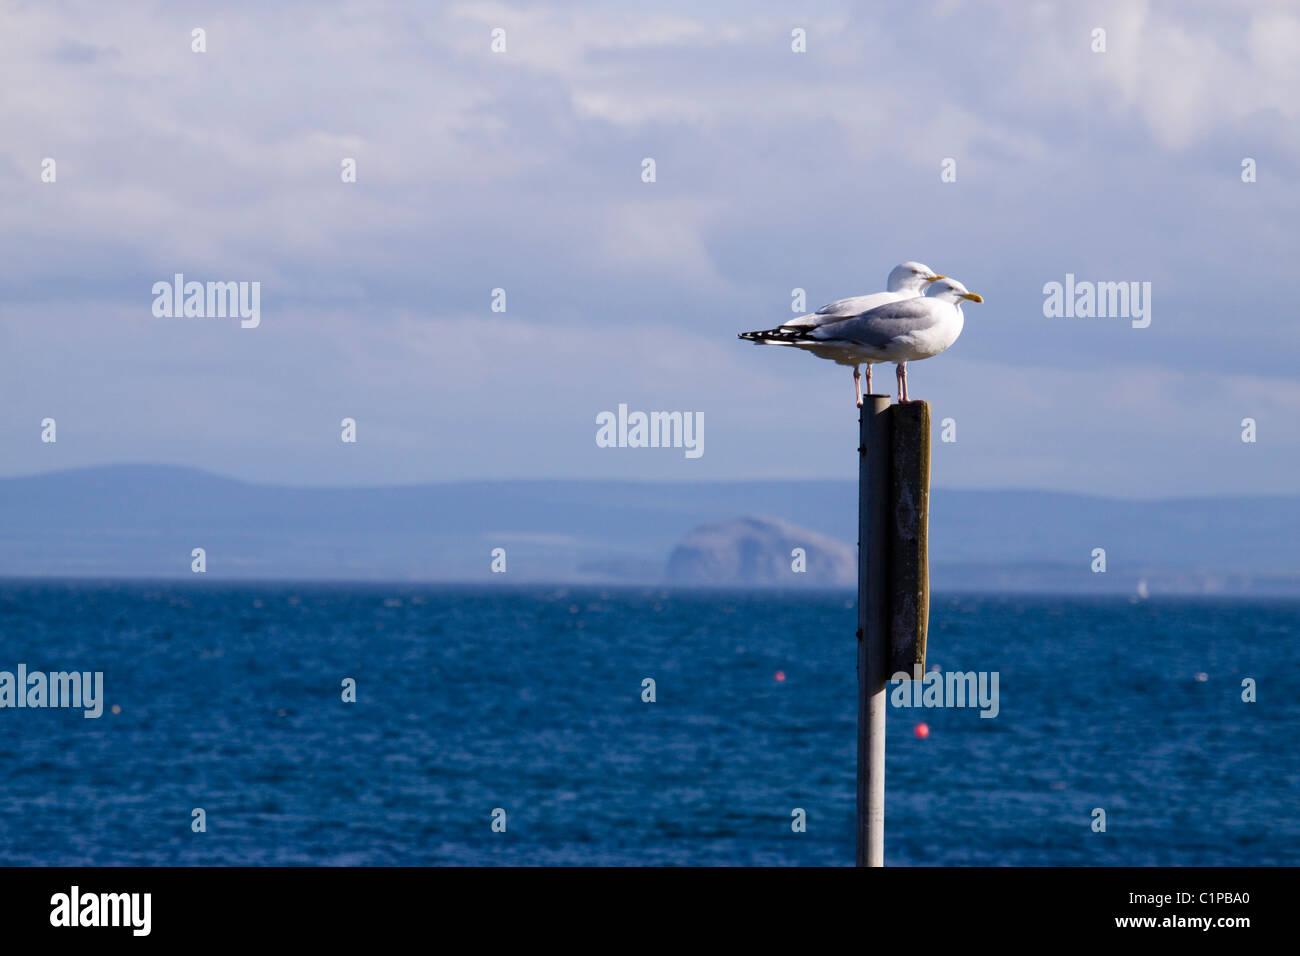 Scotland, Fife, Anstruther, Seagulls perching on signpost overlooking sea - Stock Image